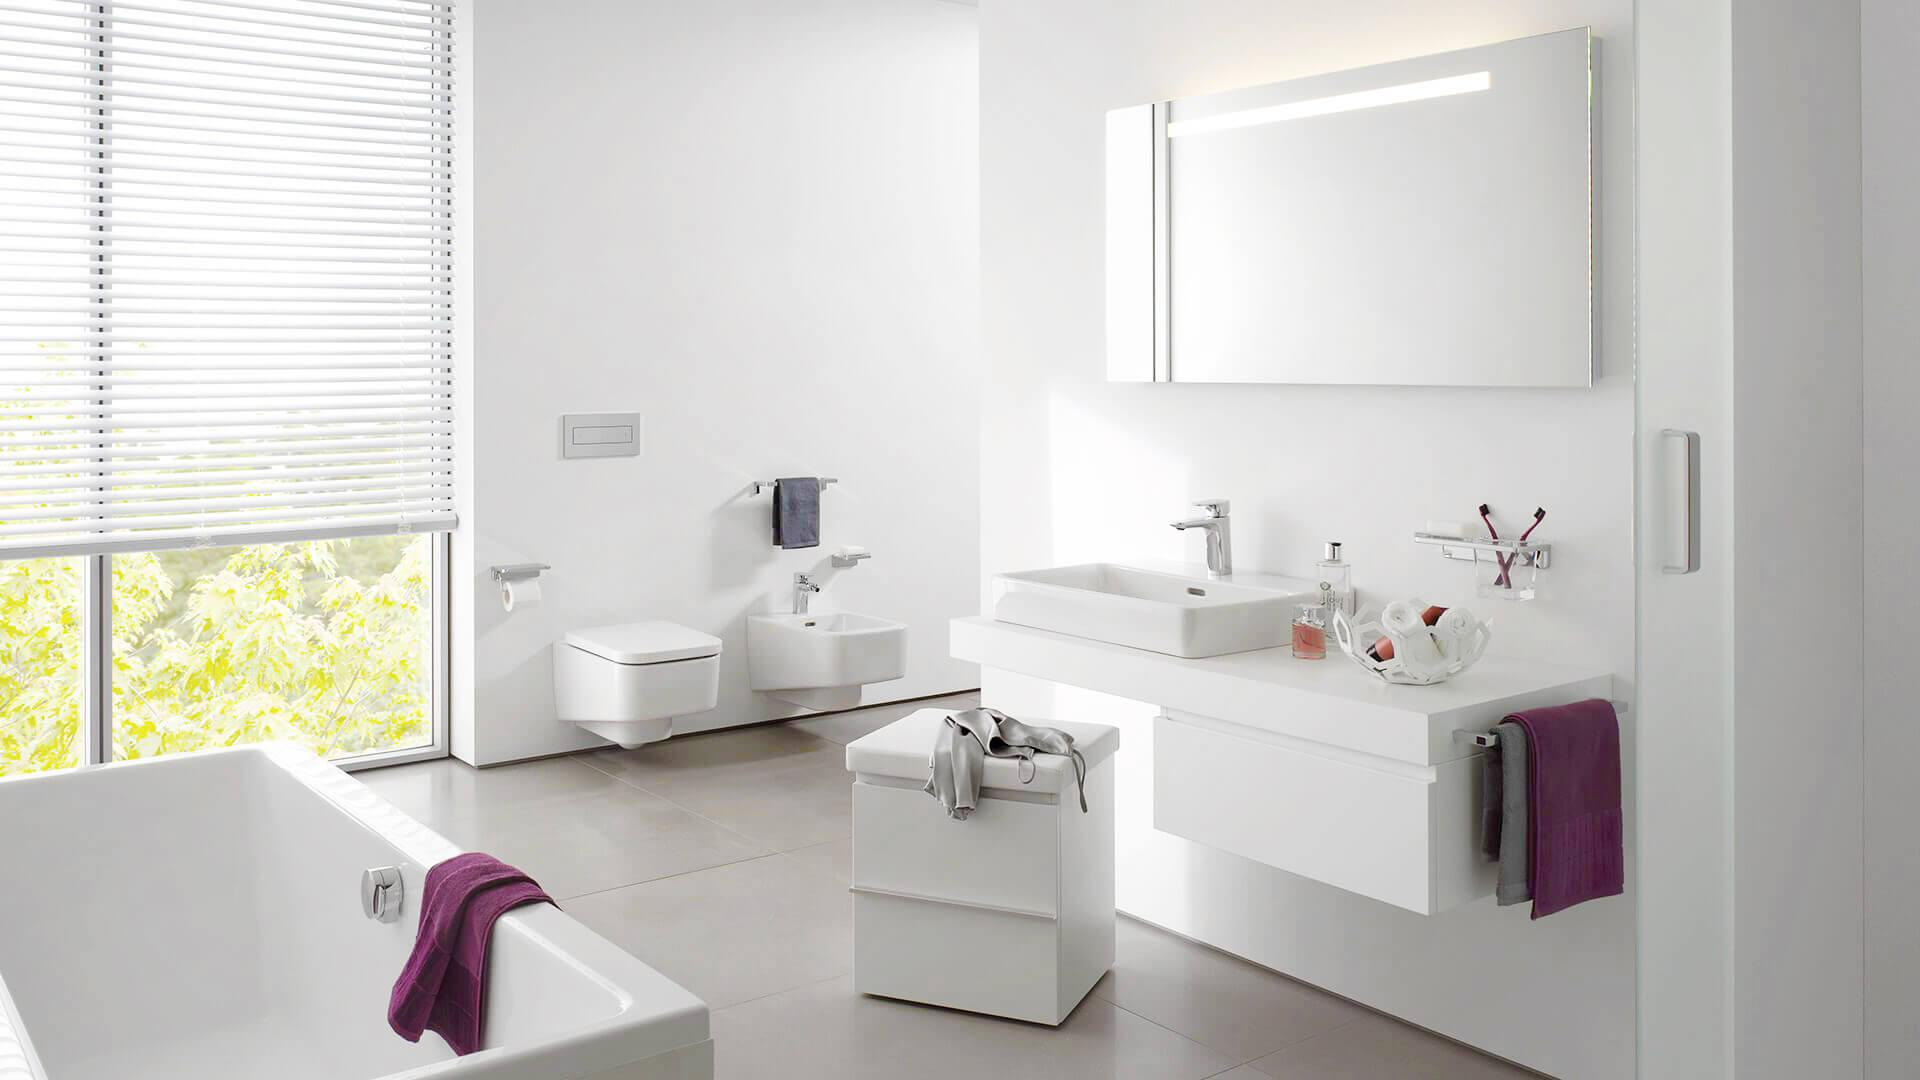 Laufen ap01 totalbathroom 1 s RGB DL